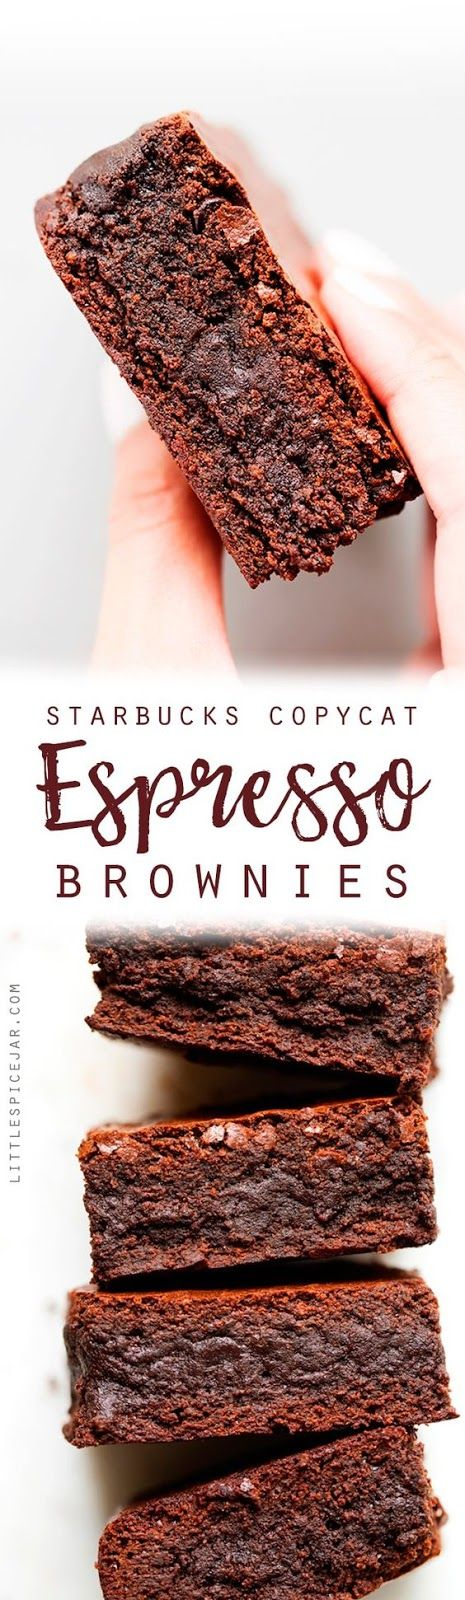 STARBUCKS COPYCAT ESPRESSO BROWNIES   Cake And Food Recipe